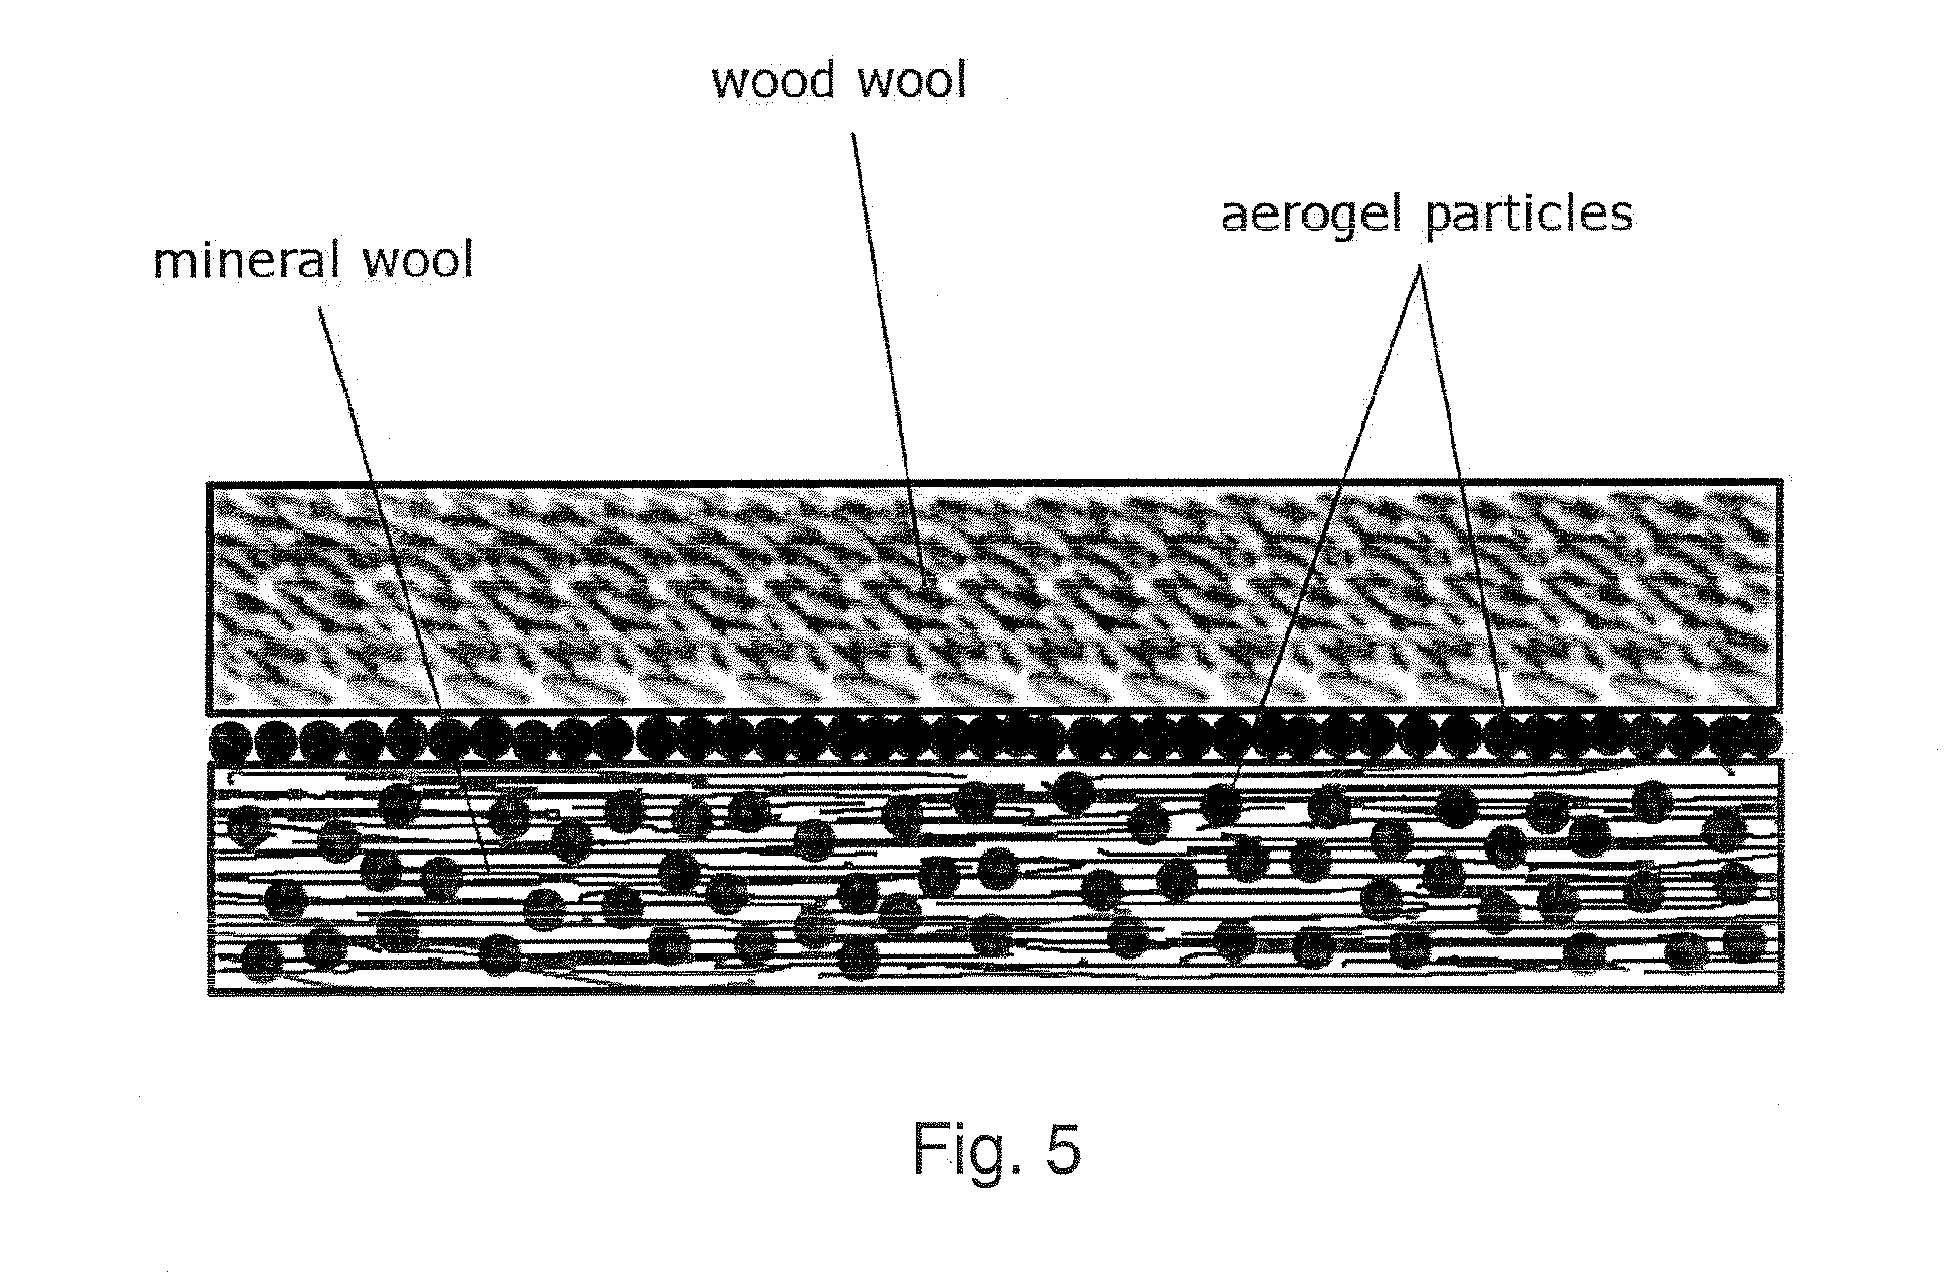 patente ep2281962a2 aerogel containing composite. Black Bedroom Furniture Sets. Home Design Ideas